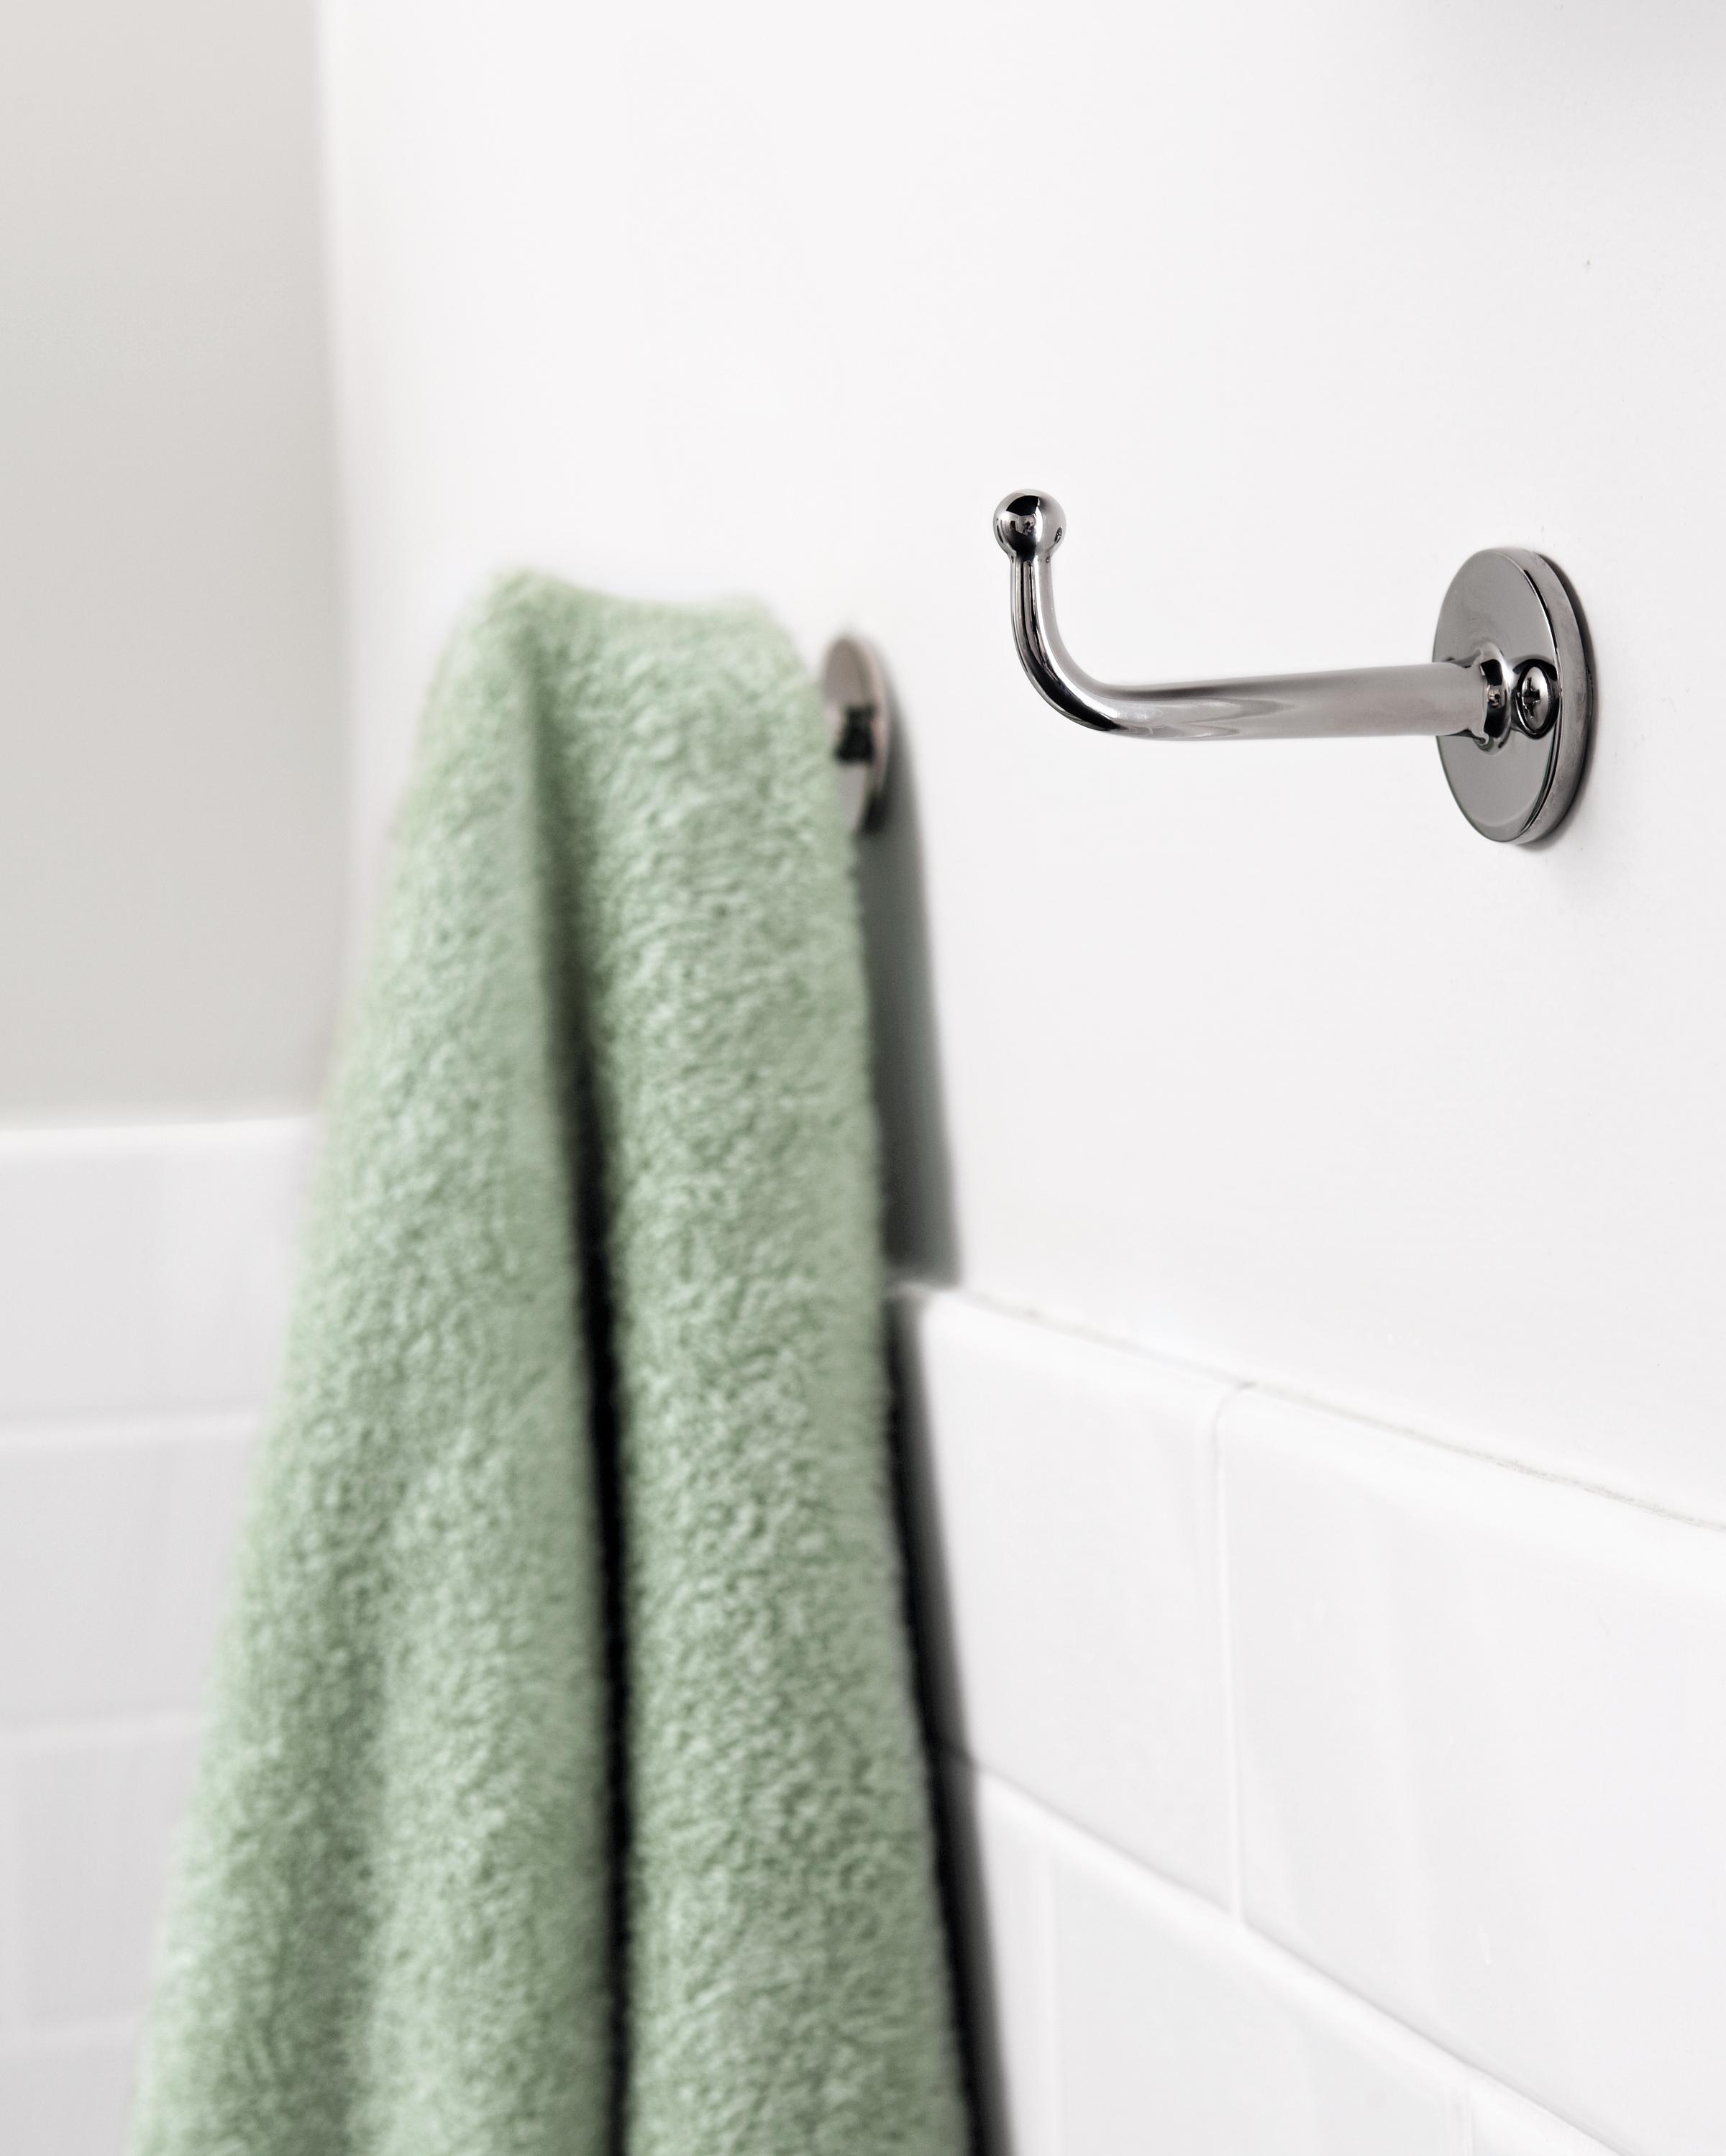 bathroom-storage-hooks-6223-d111382.jpg